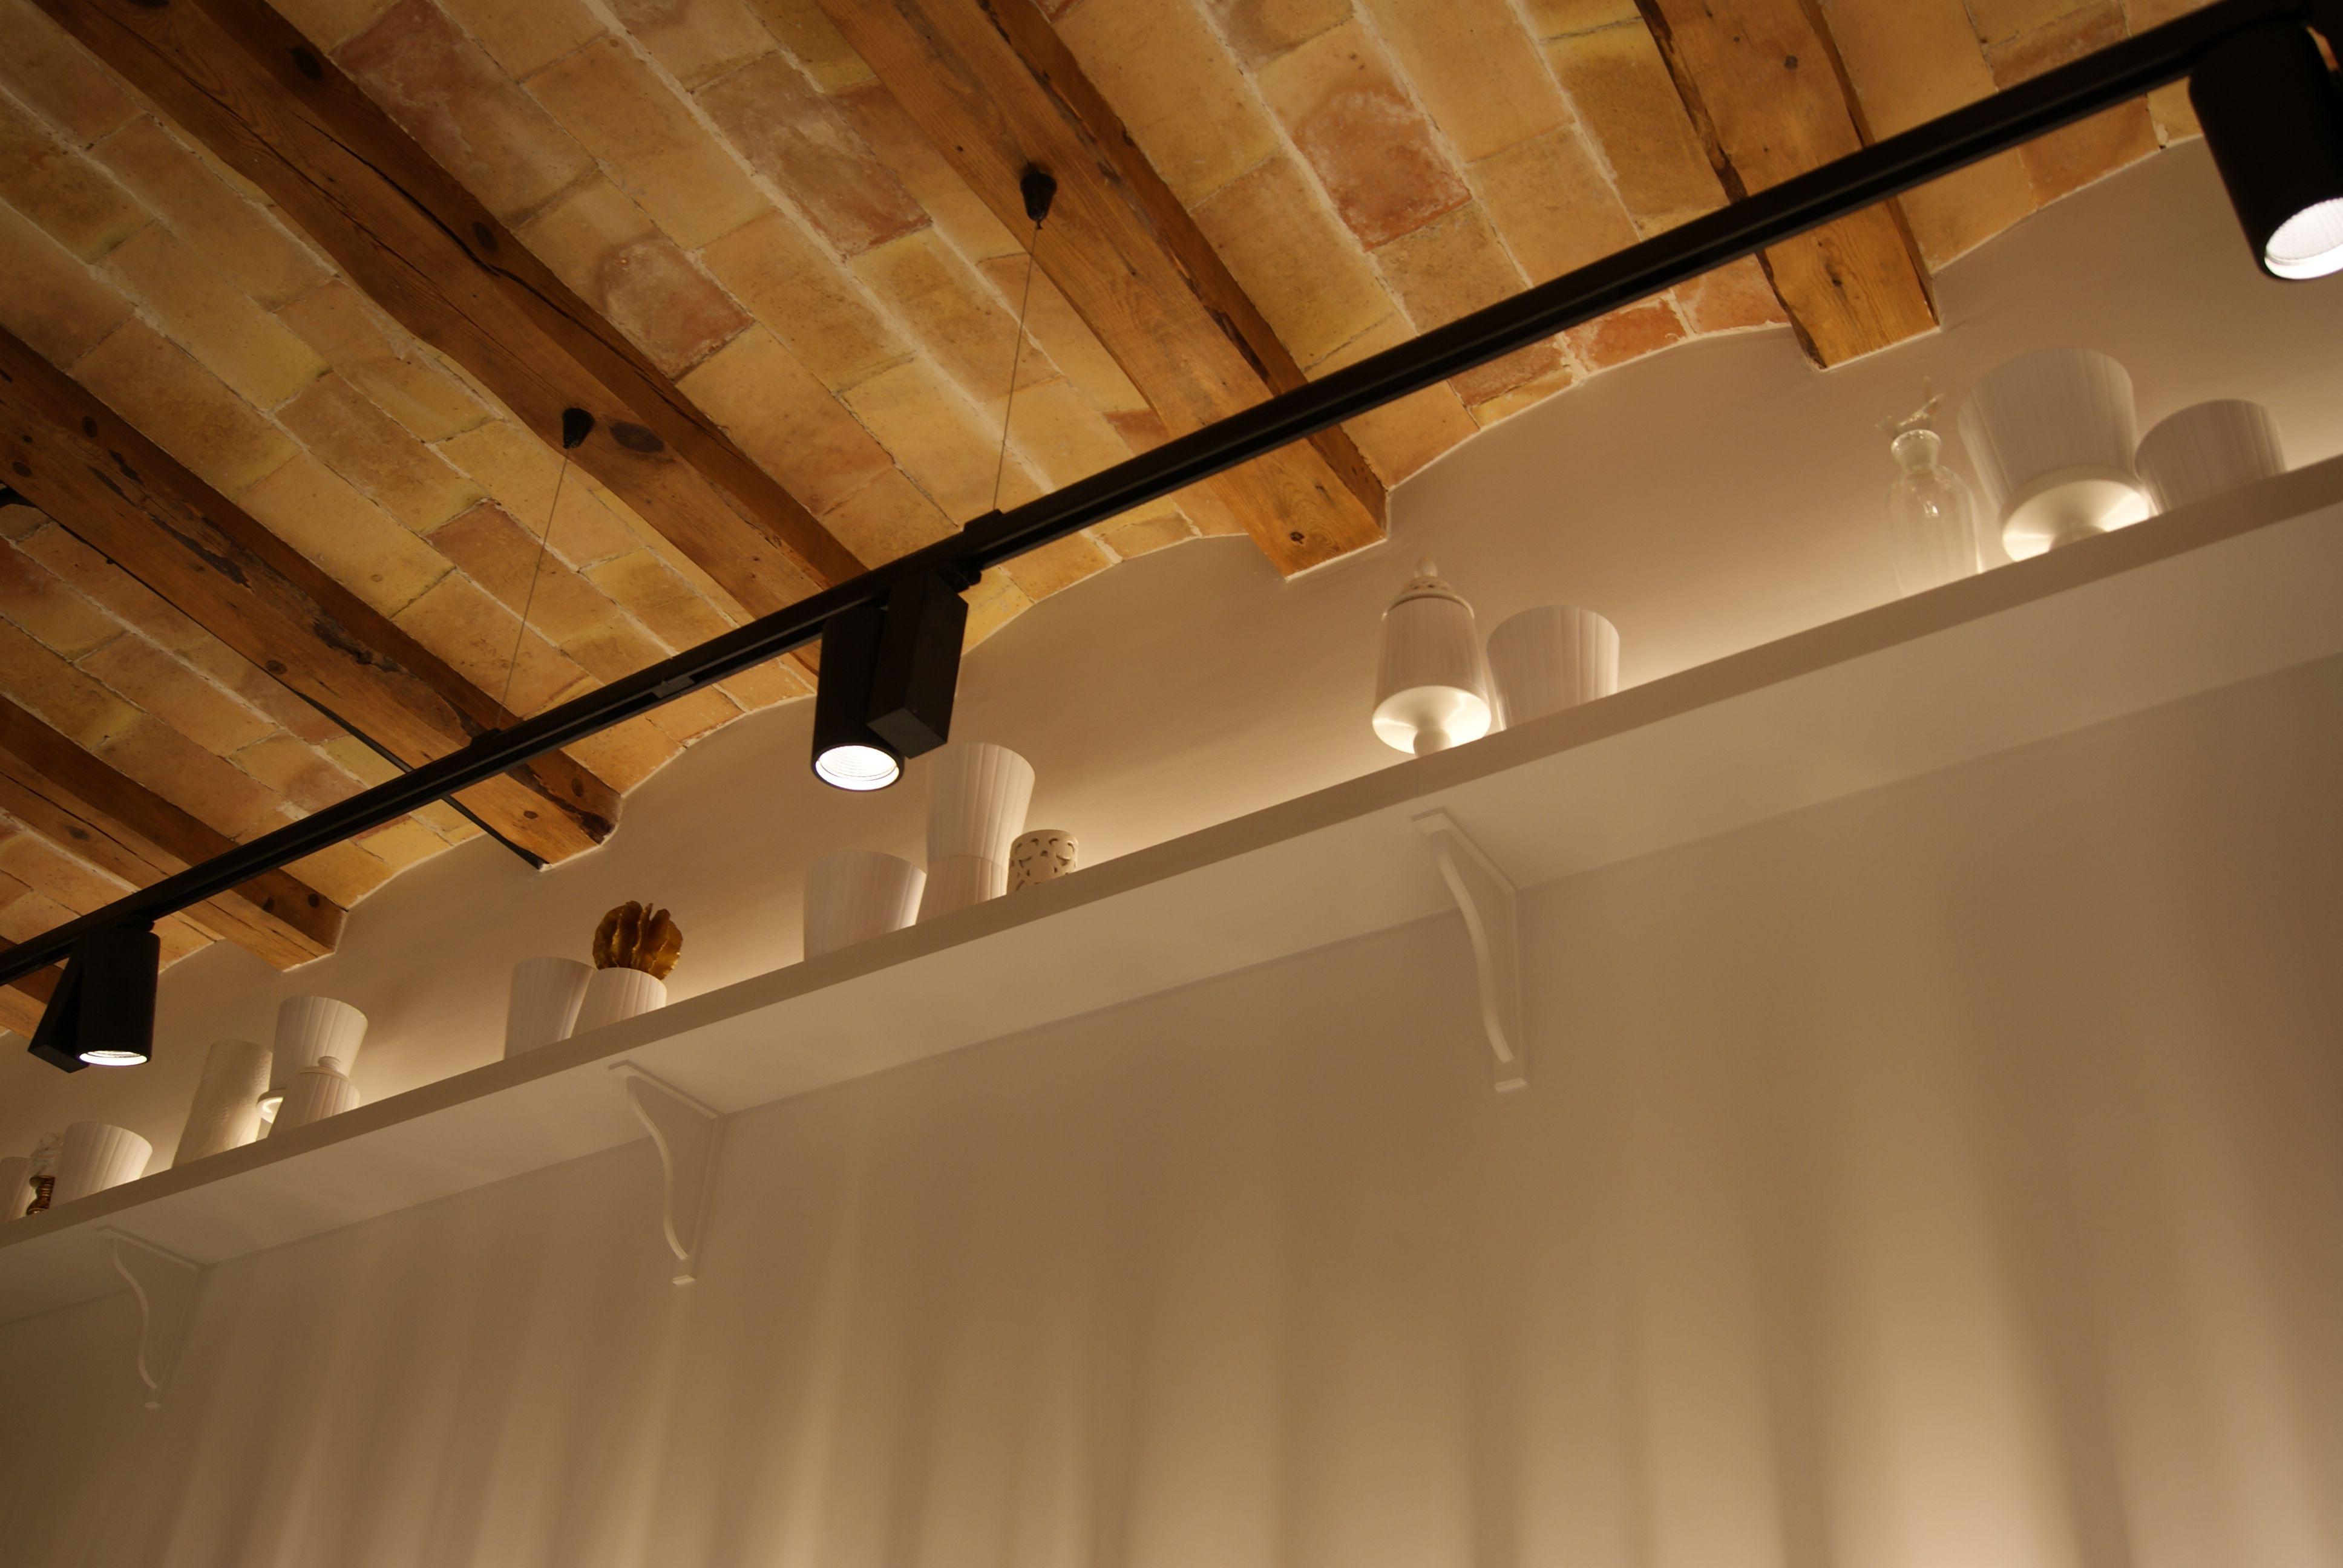 Iluminacion techo vigas madera buscar con google - Vigas madera techo ...